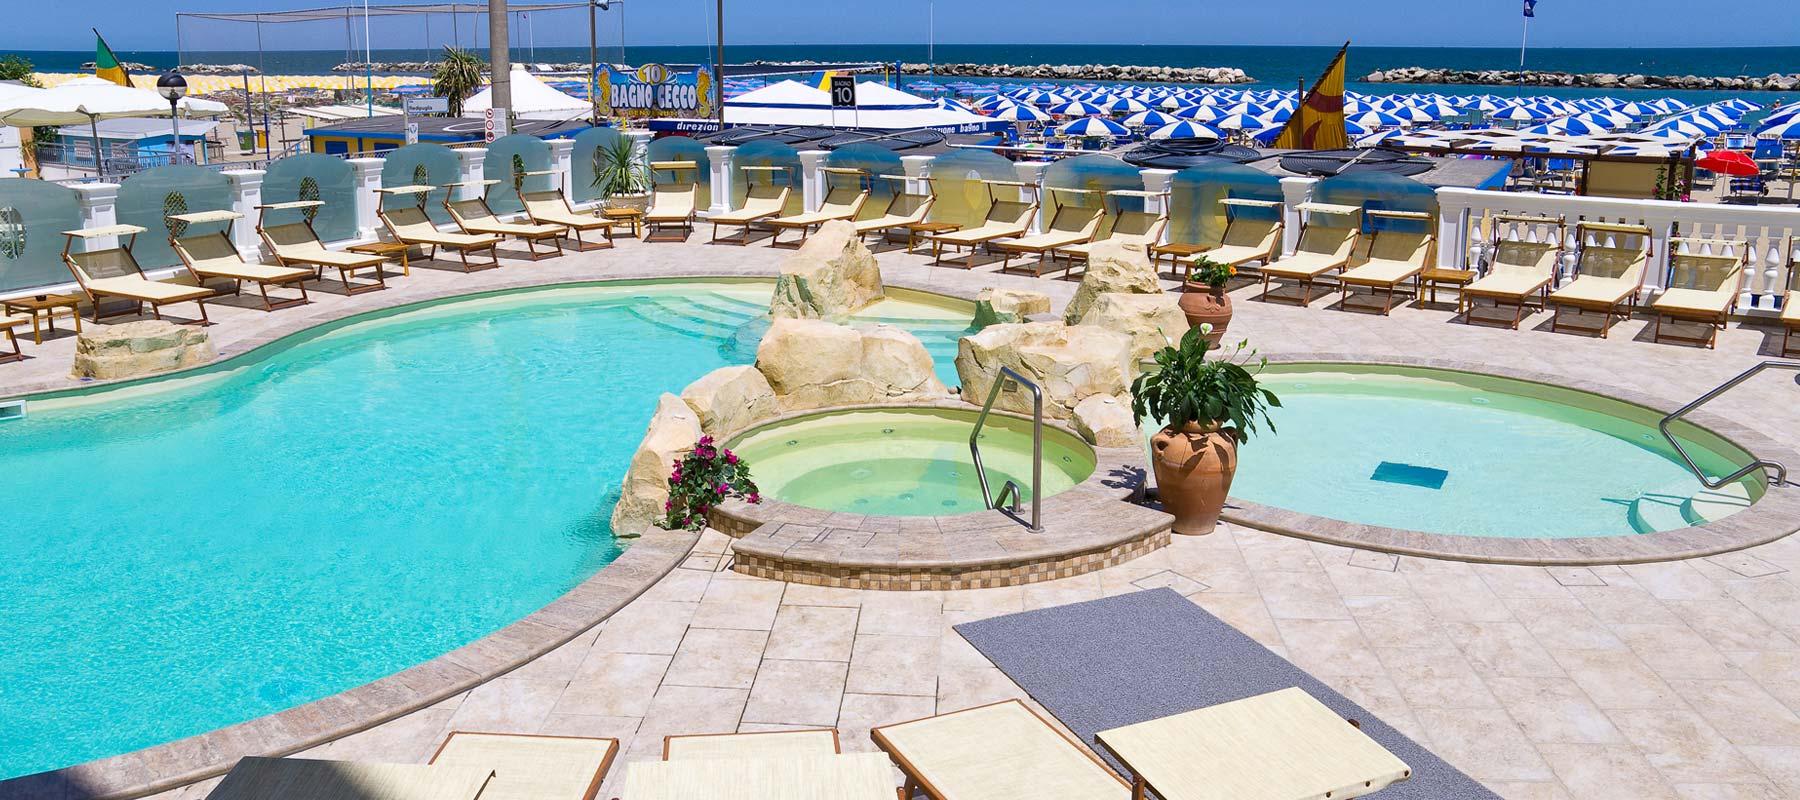 Hotel montanari 3 toiles bellaria avec piscine id al pour les familles au bord de la mer - Hotel con piscina bellaria ...